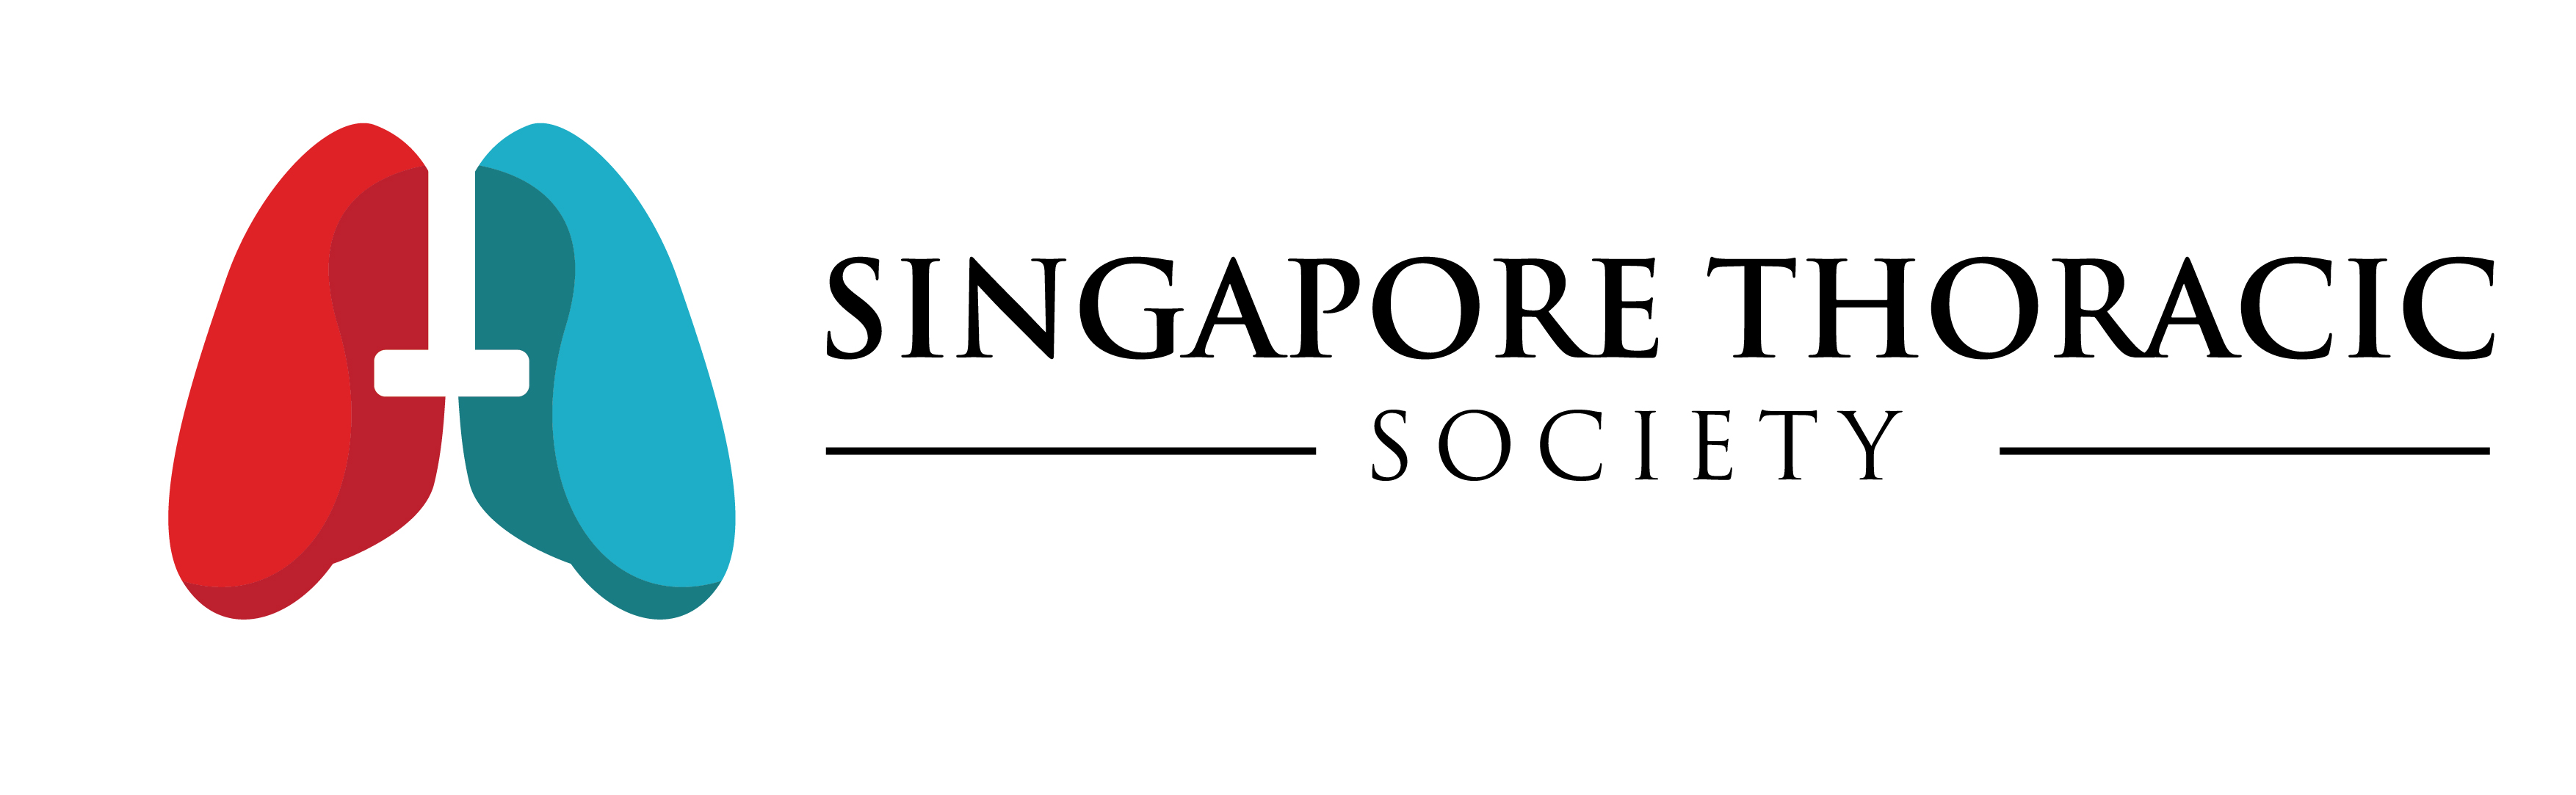 Singapore Society Thoracic